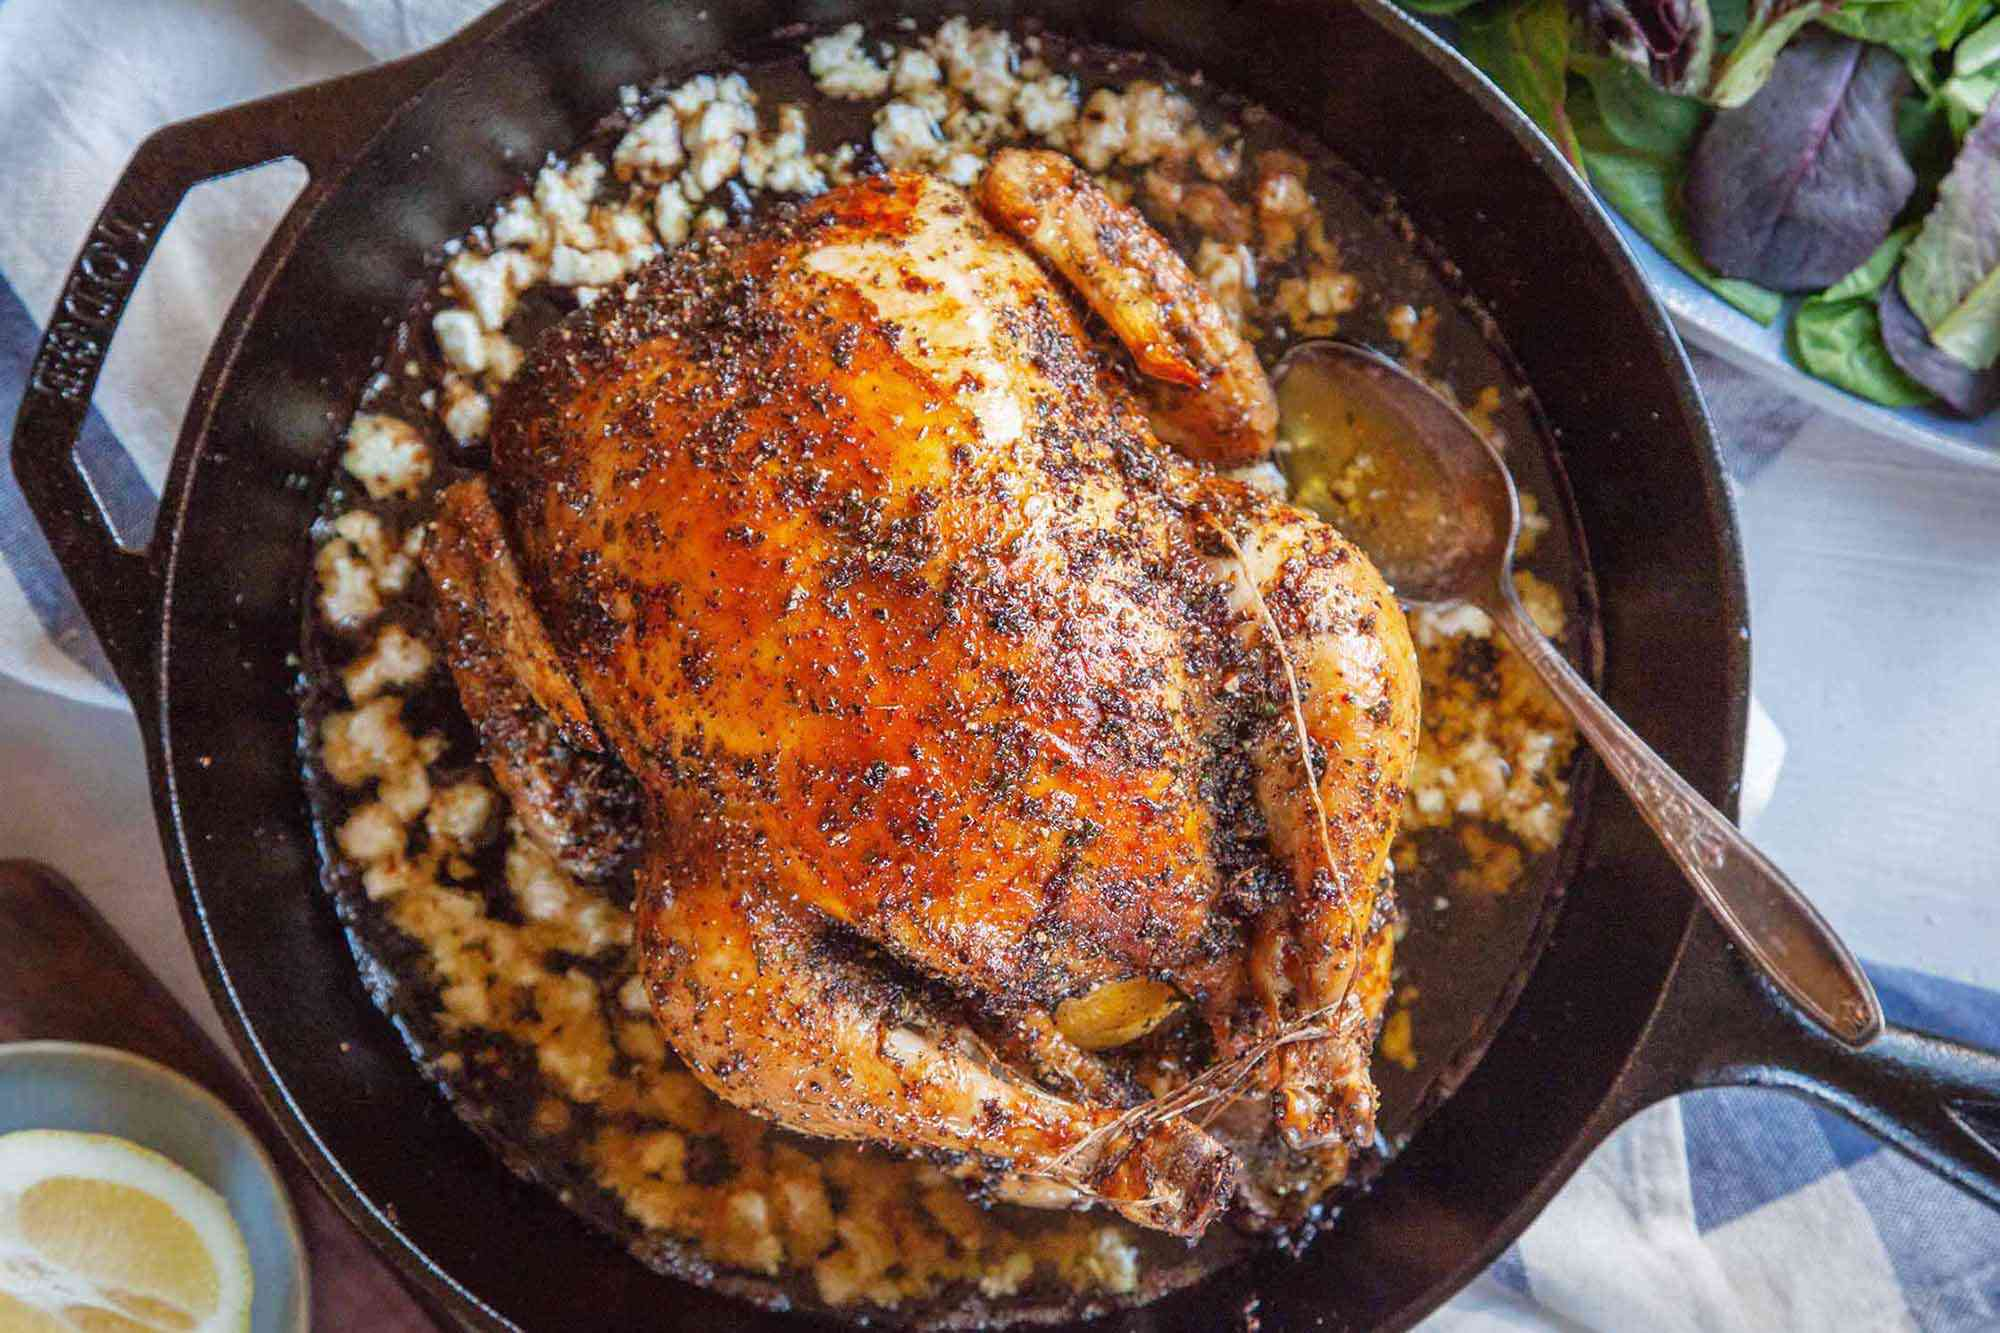 feta brine and roast chicken in a cast iron skillet